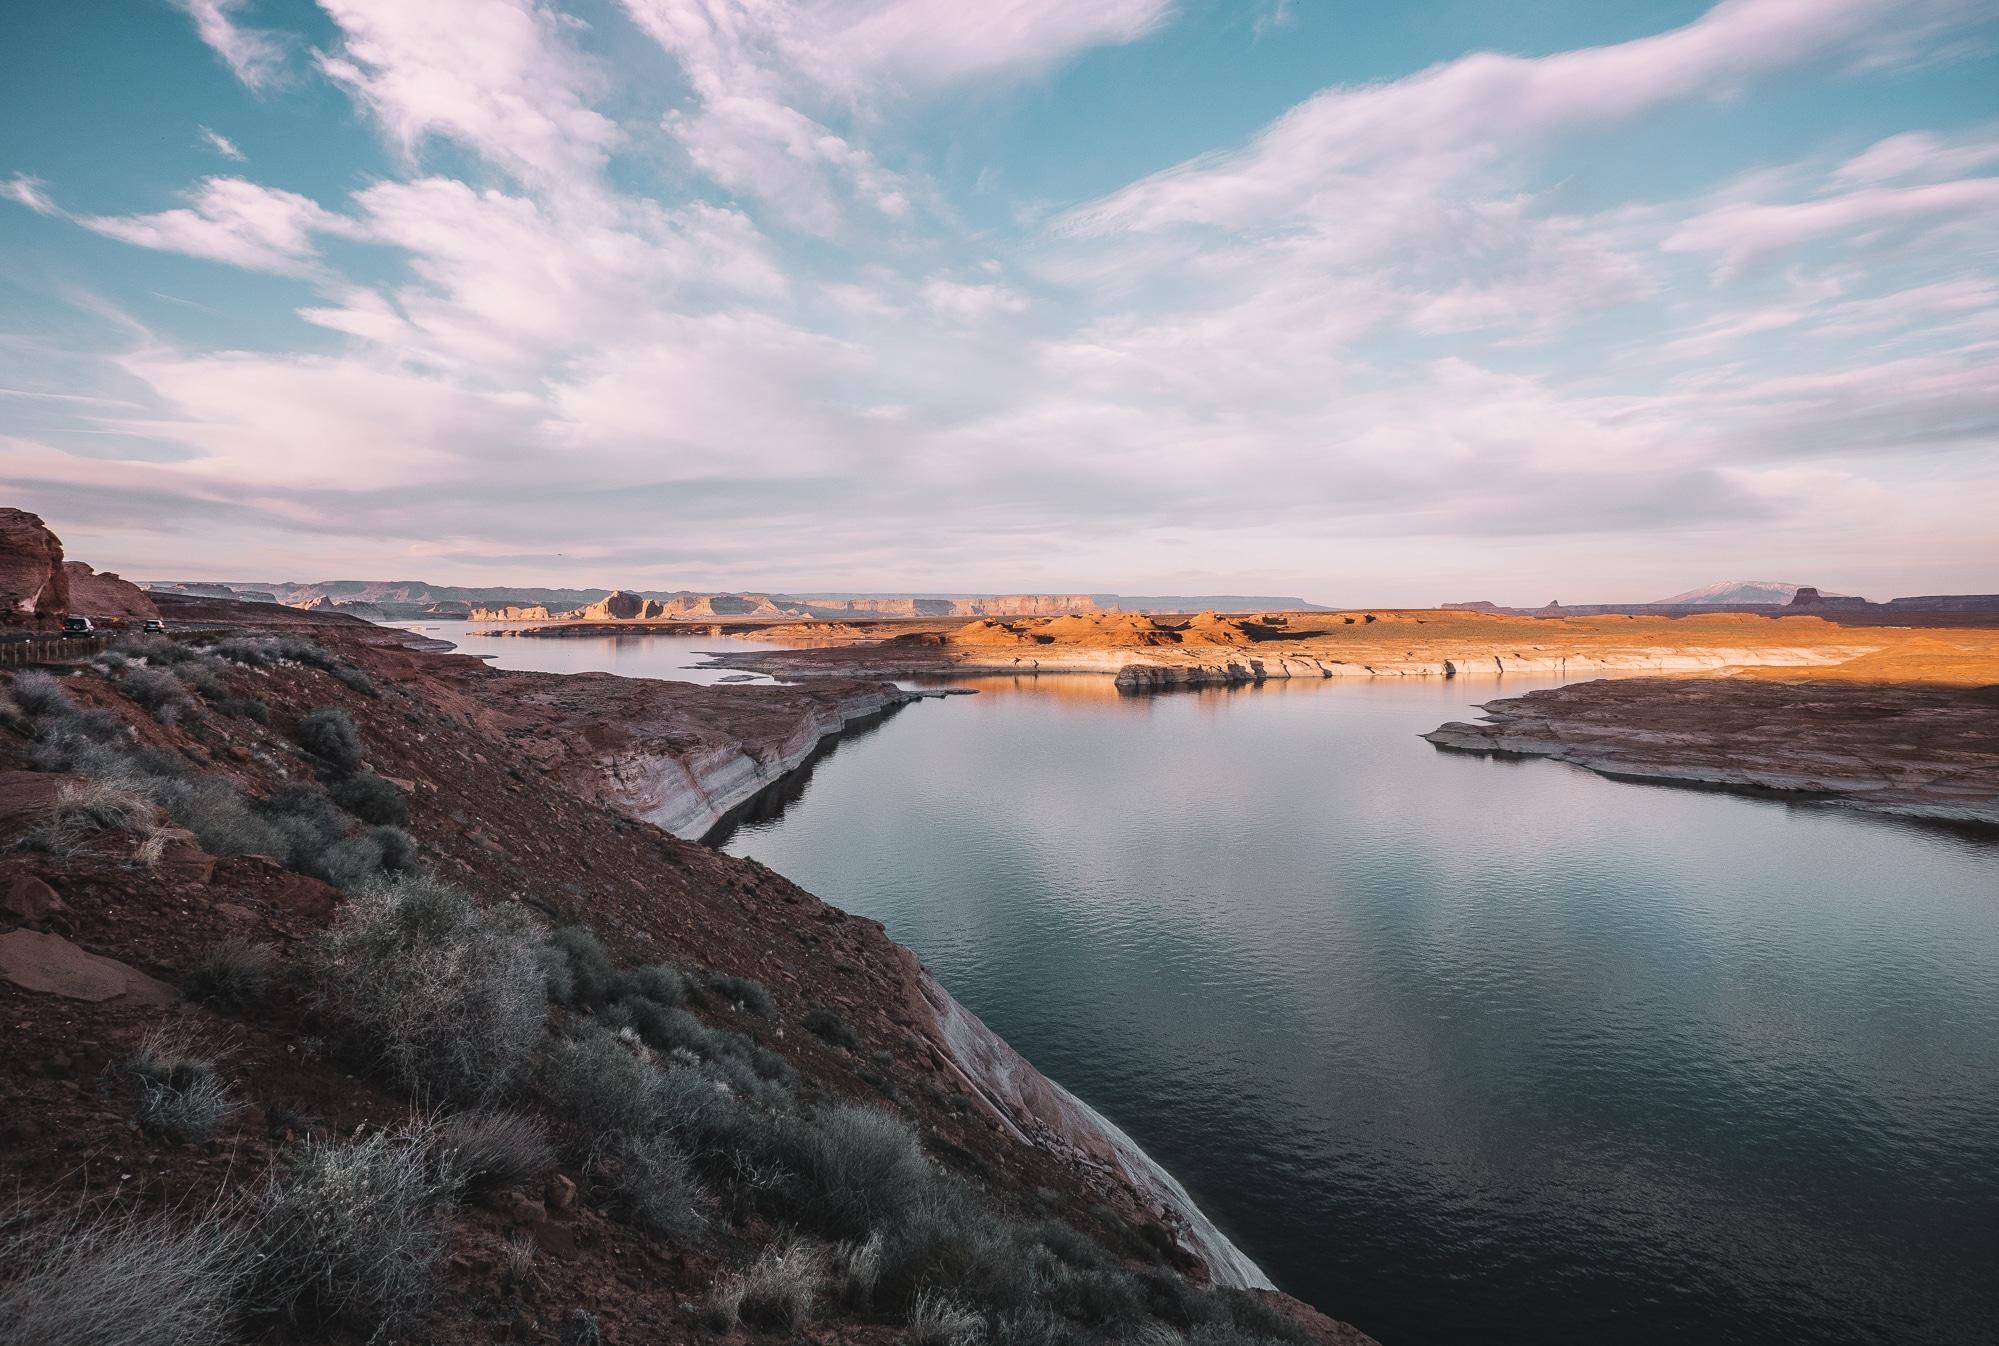 roadtrip en arizona-roadtrip ouest americain-visiter l'arizona-roadtrip de 8 jours en arizona-Lake Powell